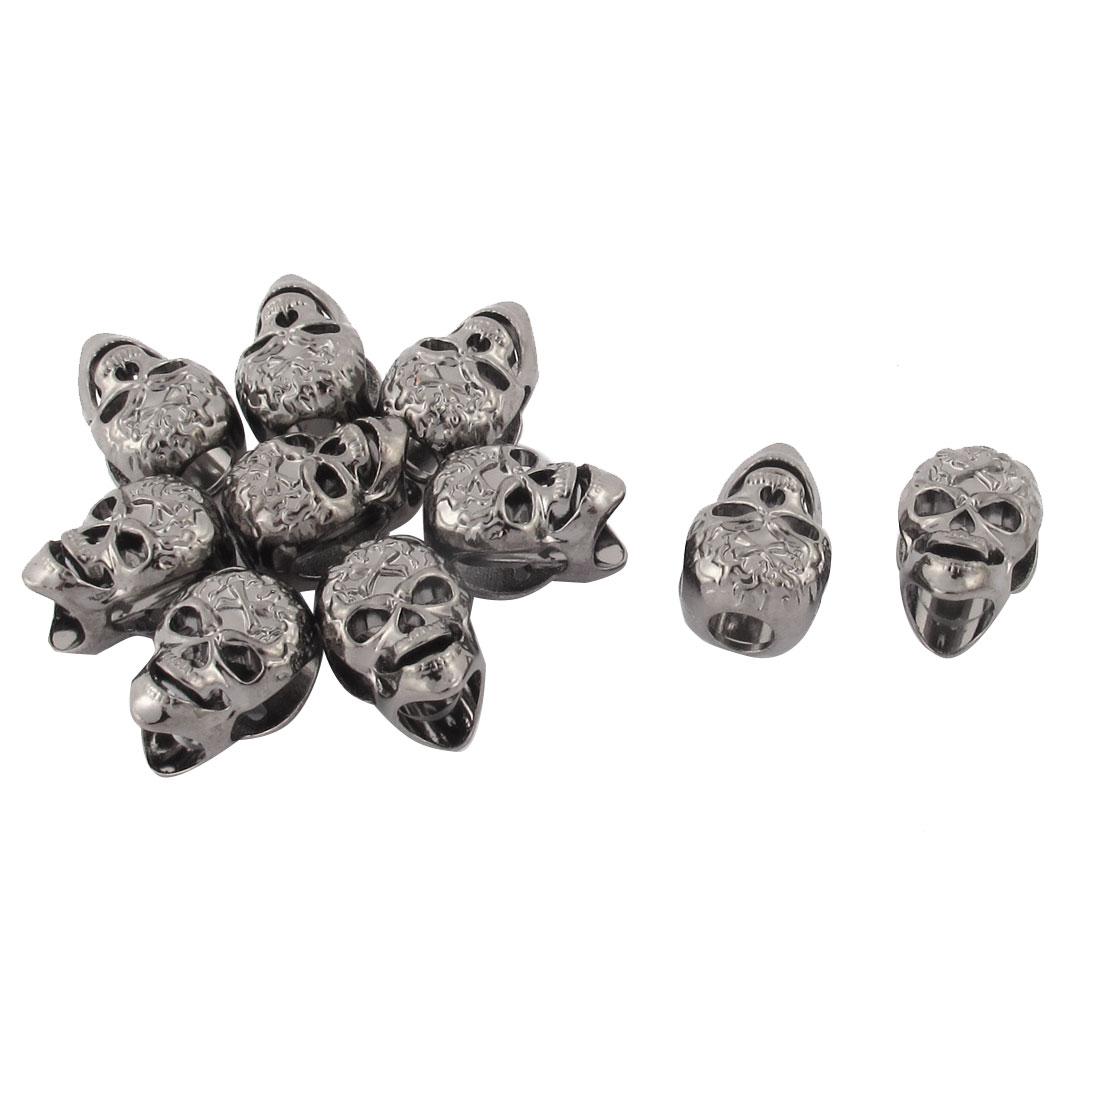 10 Pcs Silver Tone Skull Head Design Pendant Charm Bead Bracelet Connector